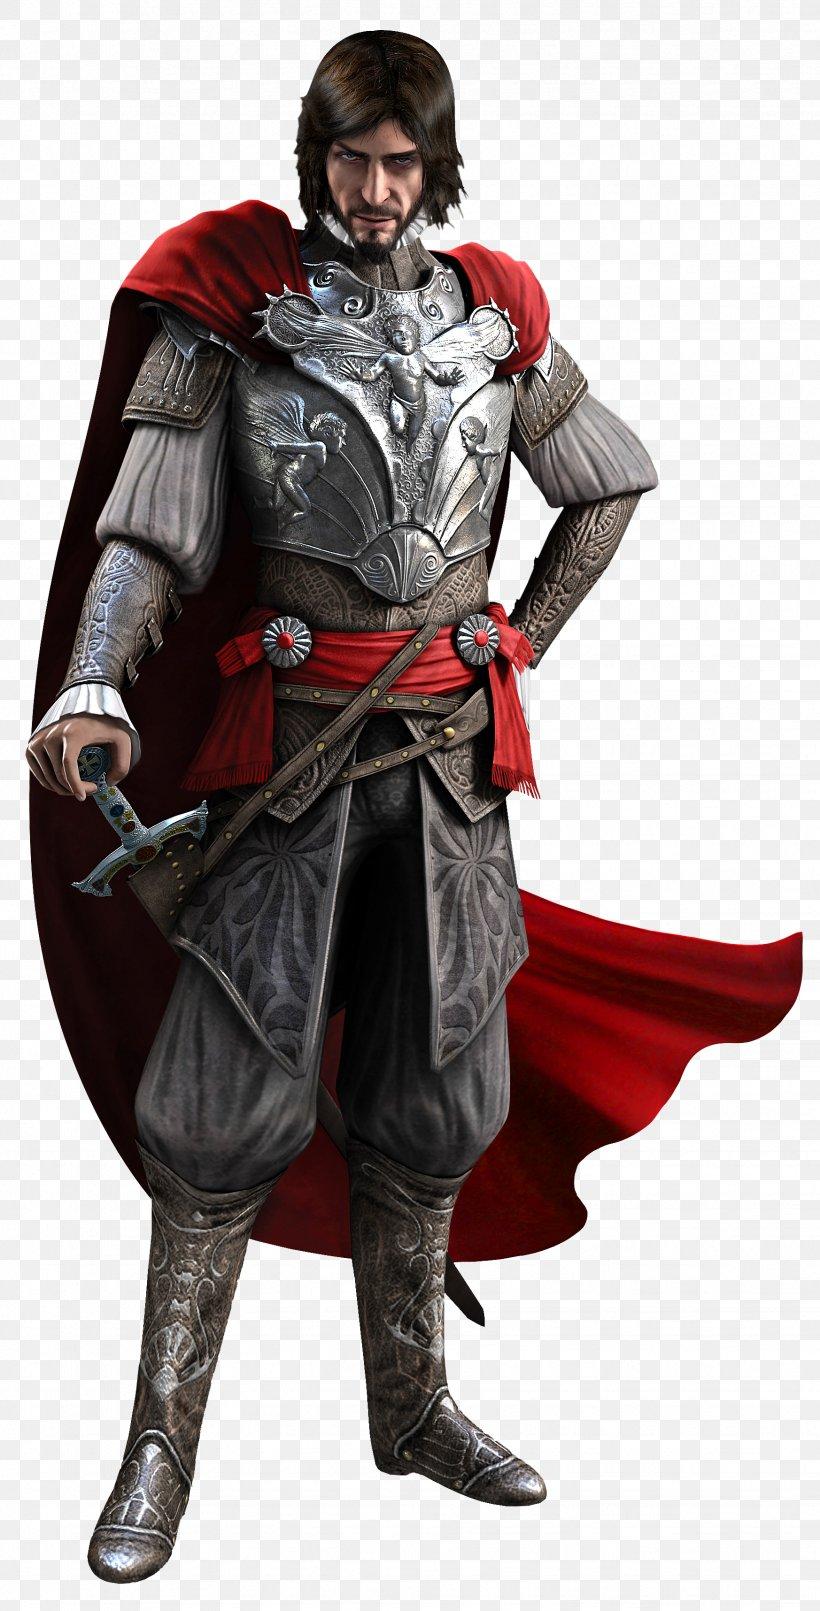 Assassin's Creed: Brotherhood Assassin's Creed II Assassin's Creed: Ezio Trilogy Ezio Auditore, PNG, 1746x3432px, Assassin S Creed Ii, Armour, Assassin S Creed, Cesare Borgia, Costume Download Free